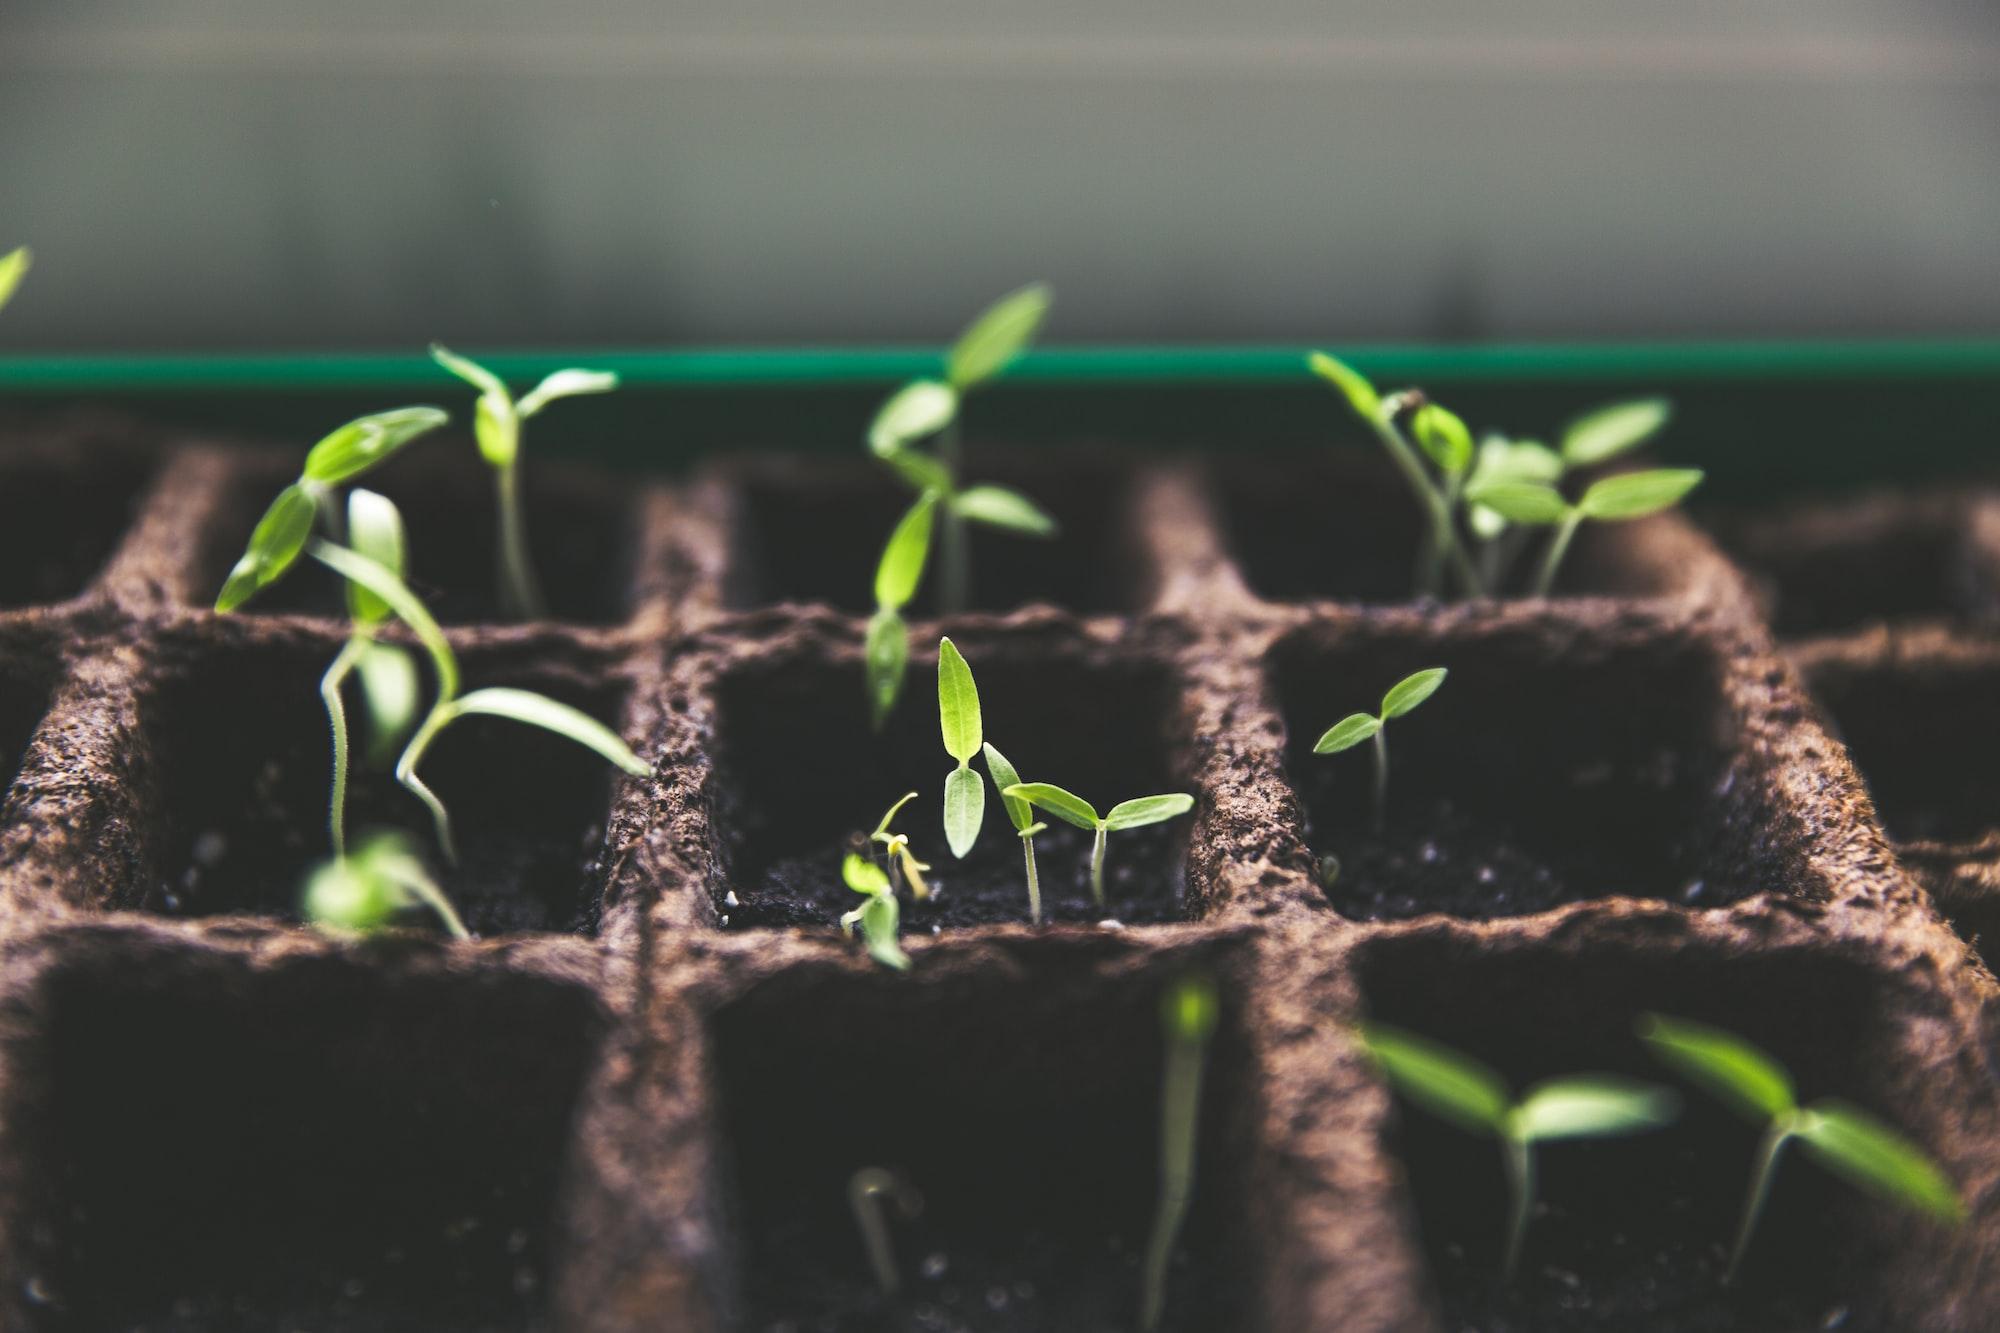 My Attitude Towards Growth on This Blog